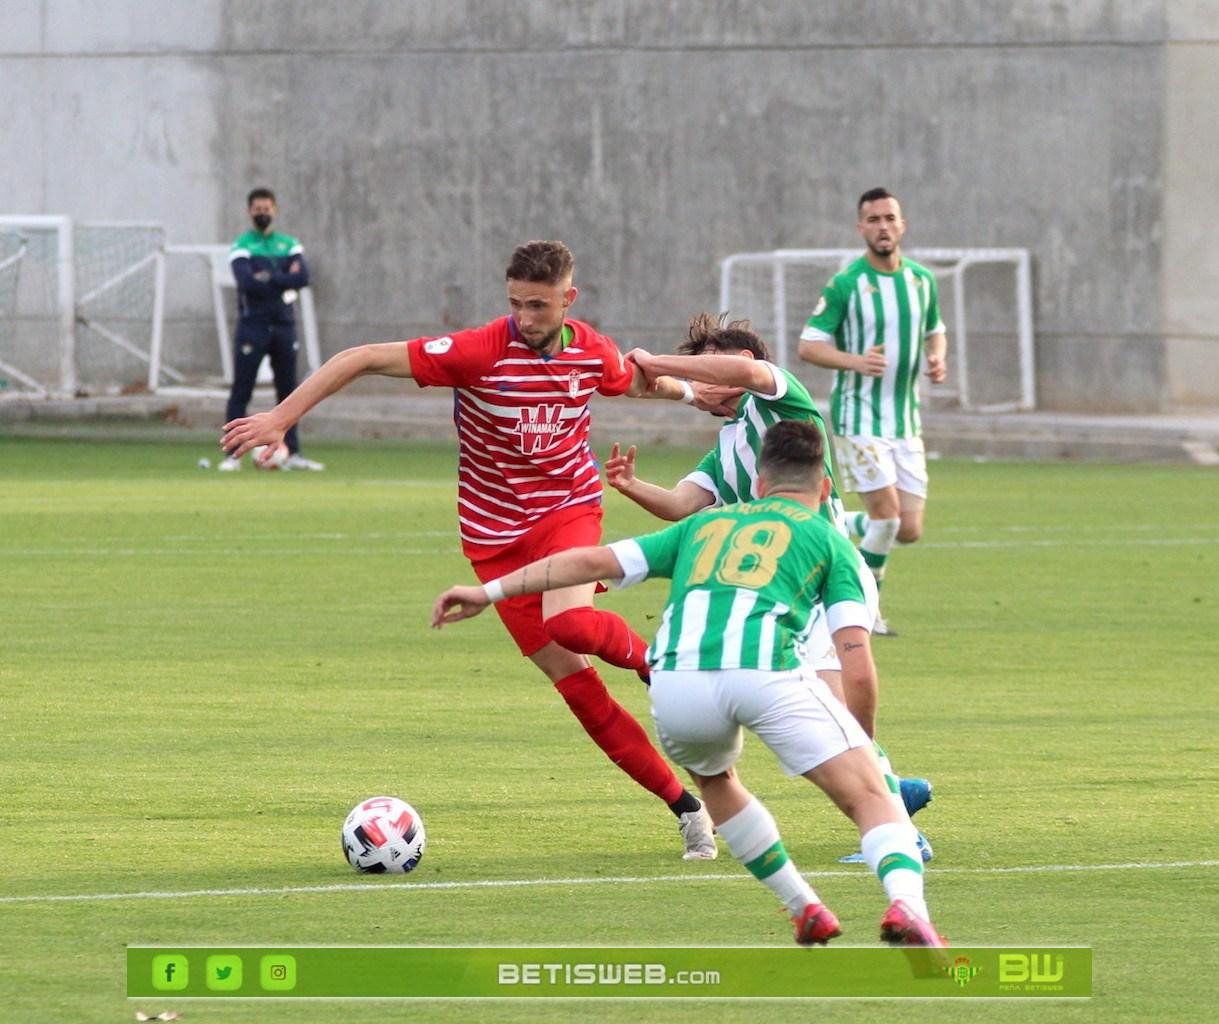 J15-Betis-Deportivo-vs-Club-Recreativo-Granada-90